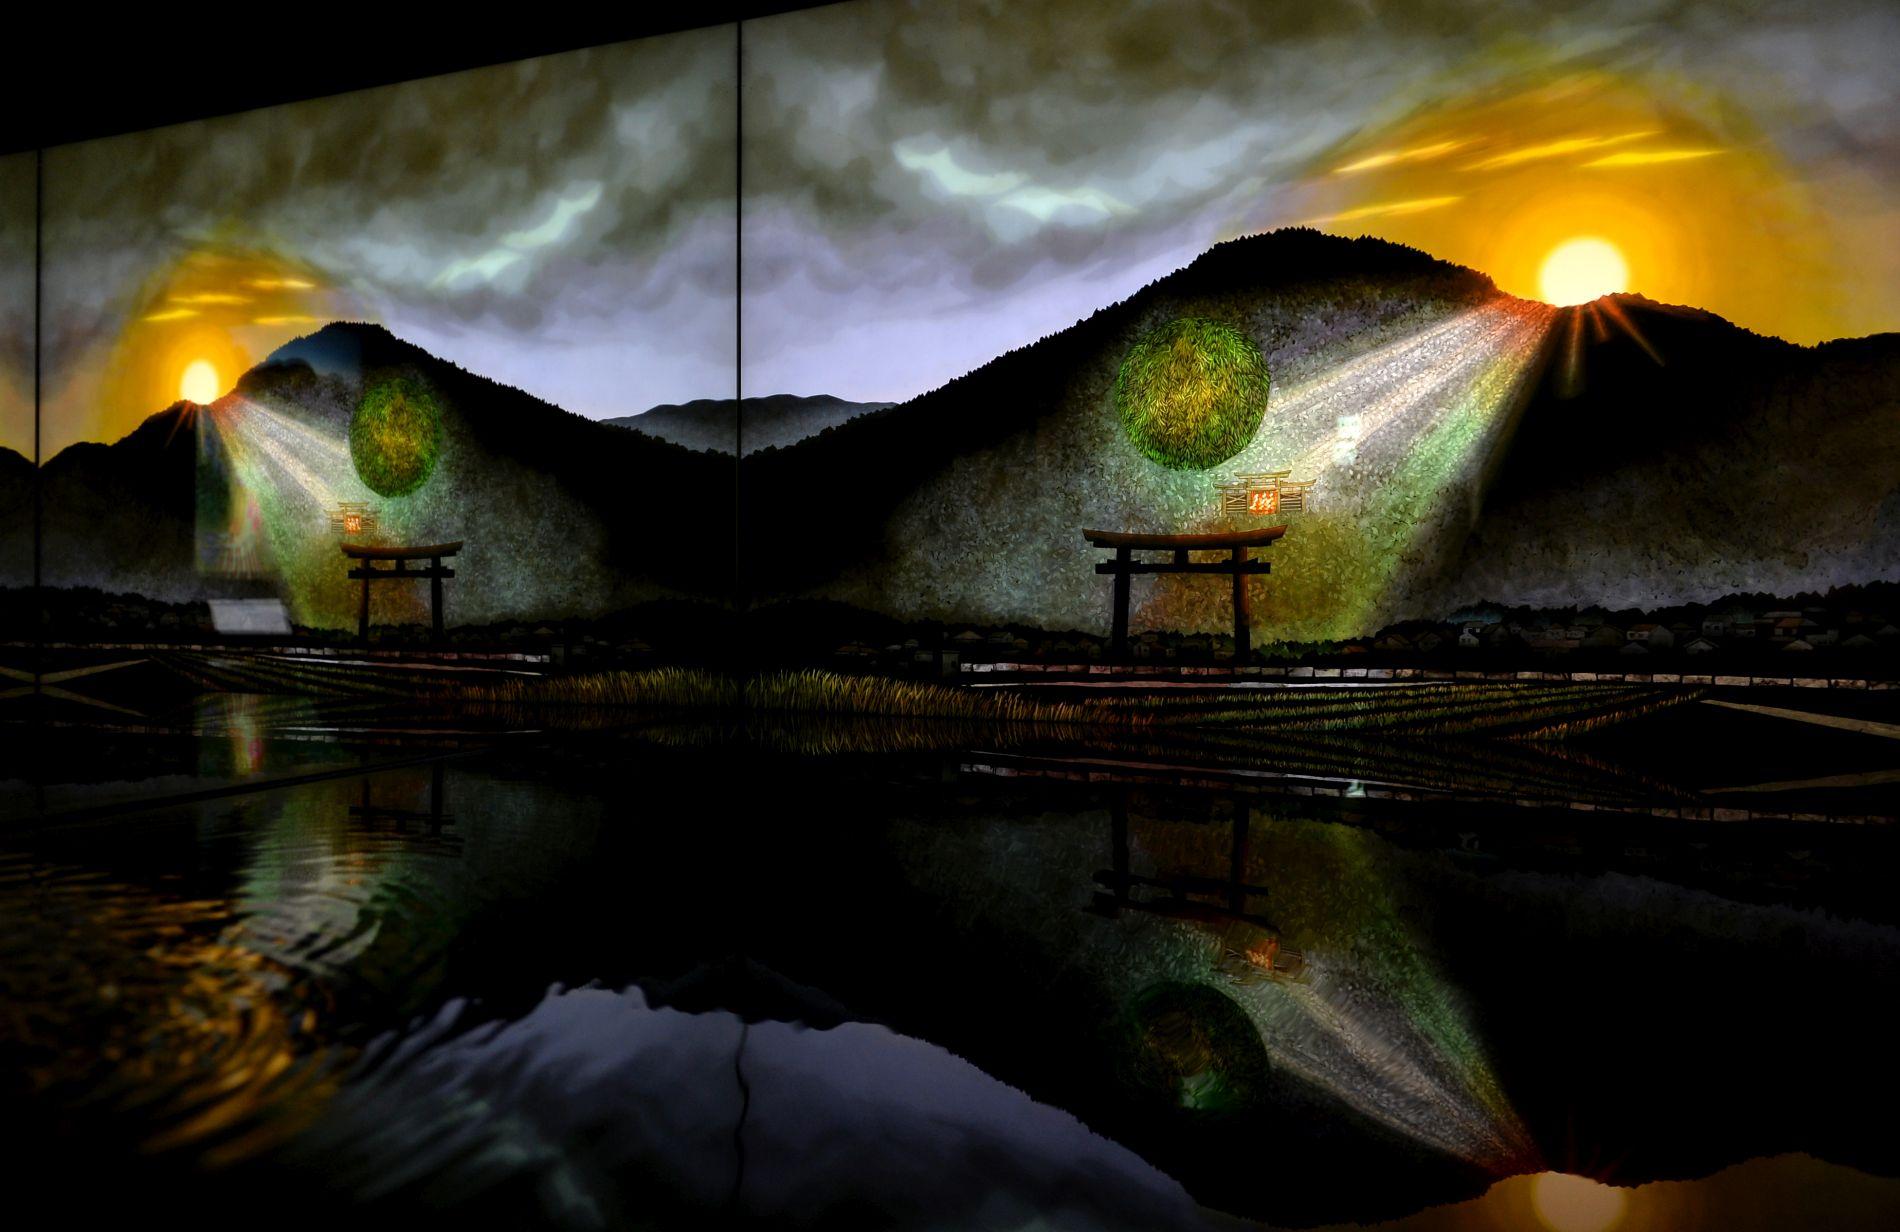 Soul of Japan Amano iwato Kami and Three Sacred Treasures 002